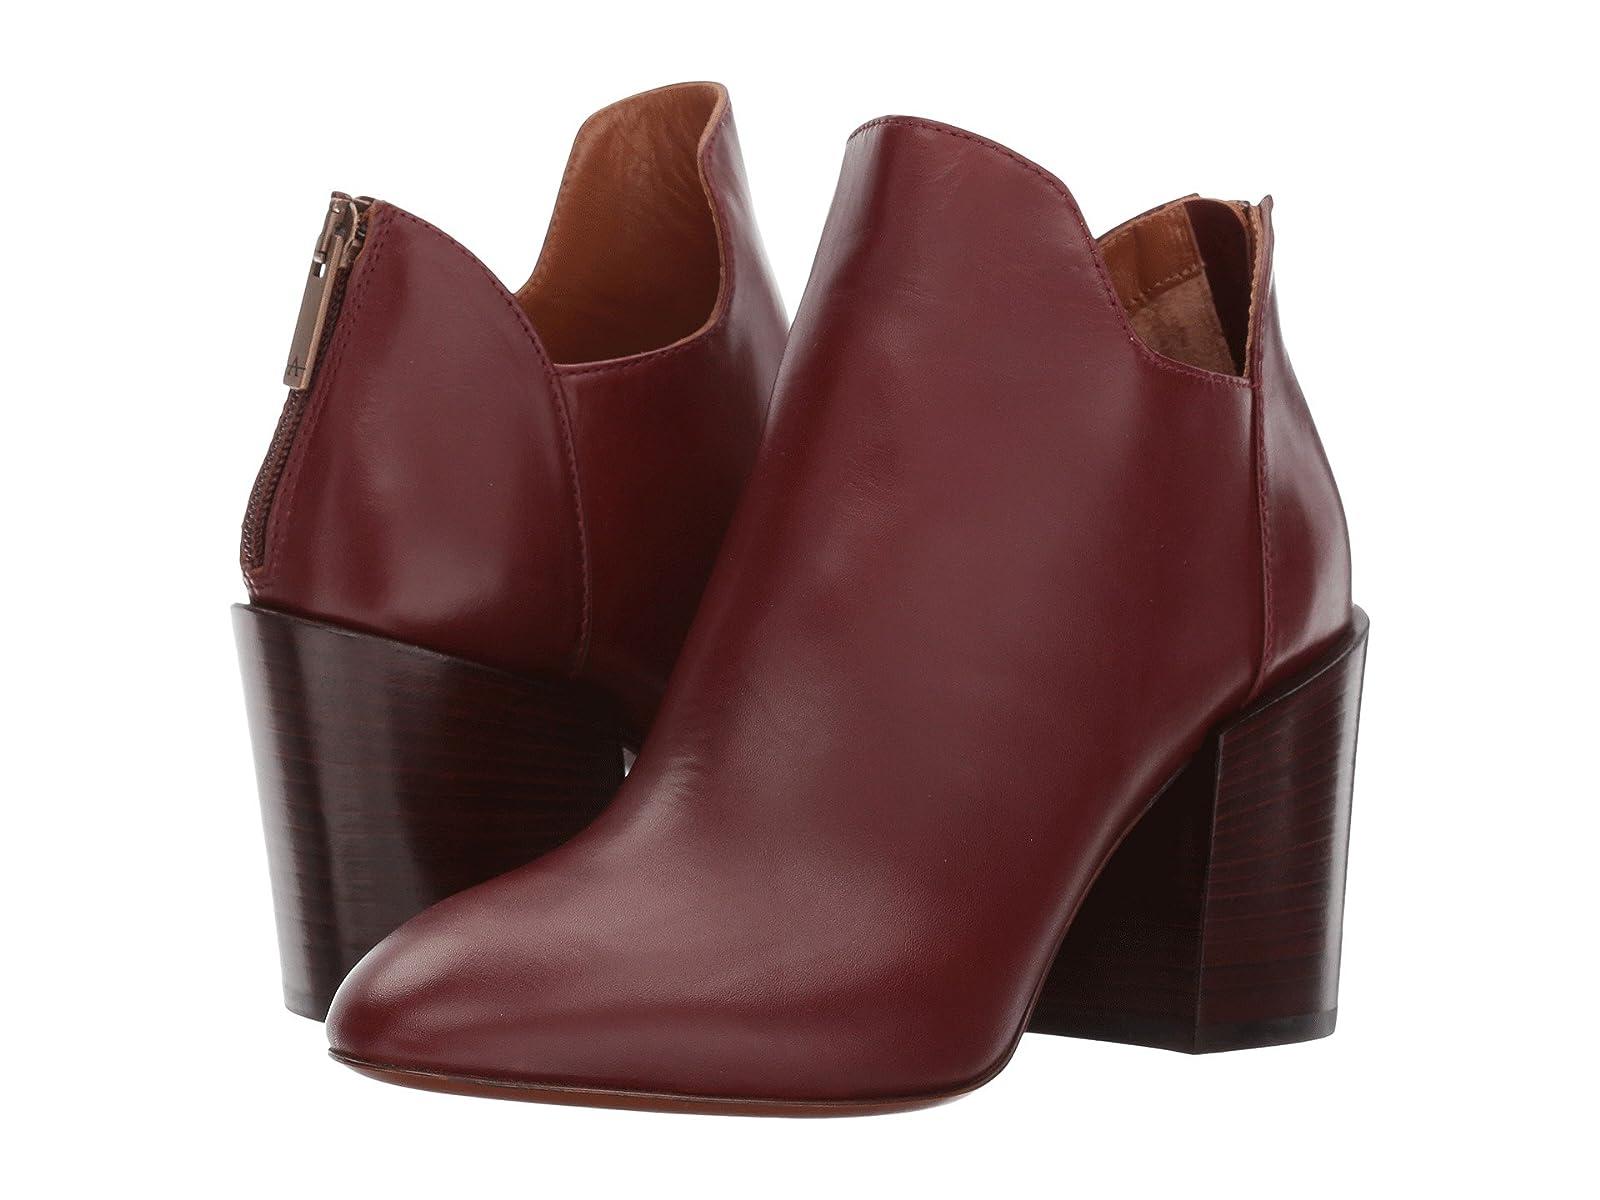 Aquatalia FrancescaCheap and distinctive eye-catching shoes